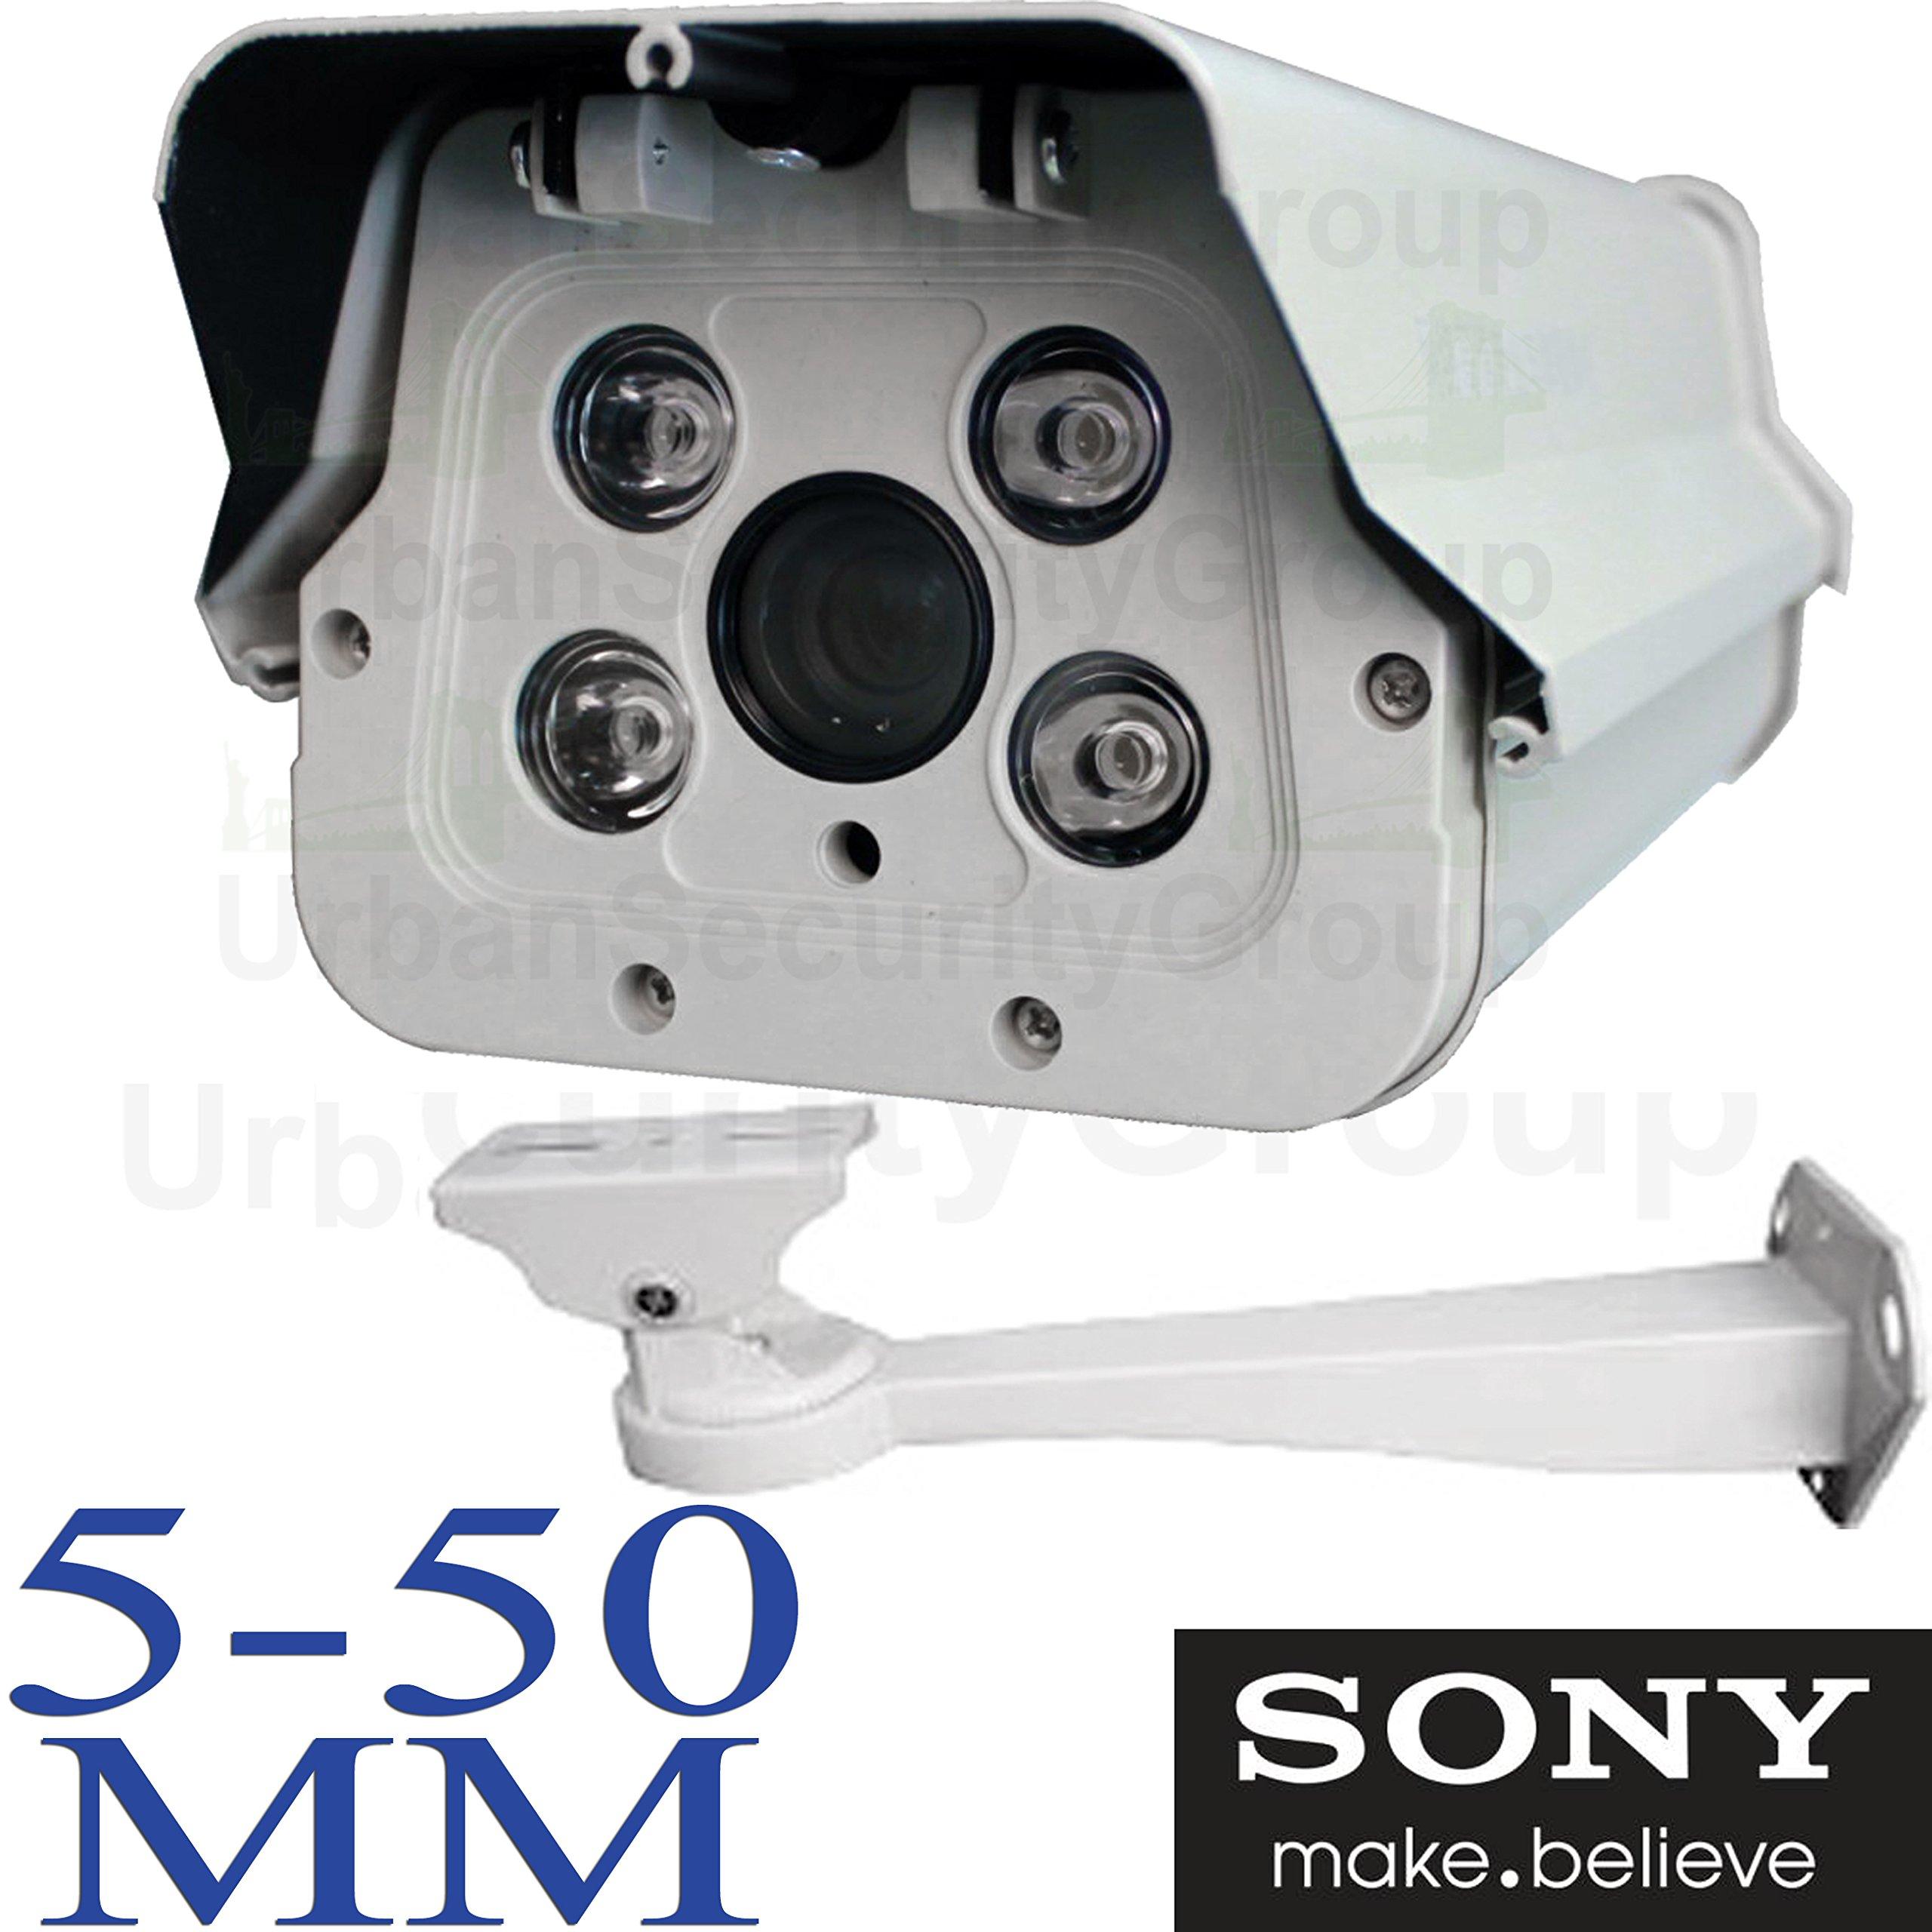 USG IP PoE 2MP 1080P Sony Ambarella Chipset : License Plate Recognition LPR Capture Bullet Security Camera : 5-50mm Vari-Focal HD Lens : 4x Array Infrared LEDs 100ft, ONVIF, Business Grade